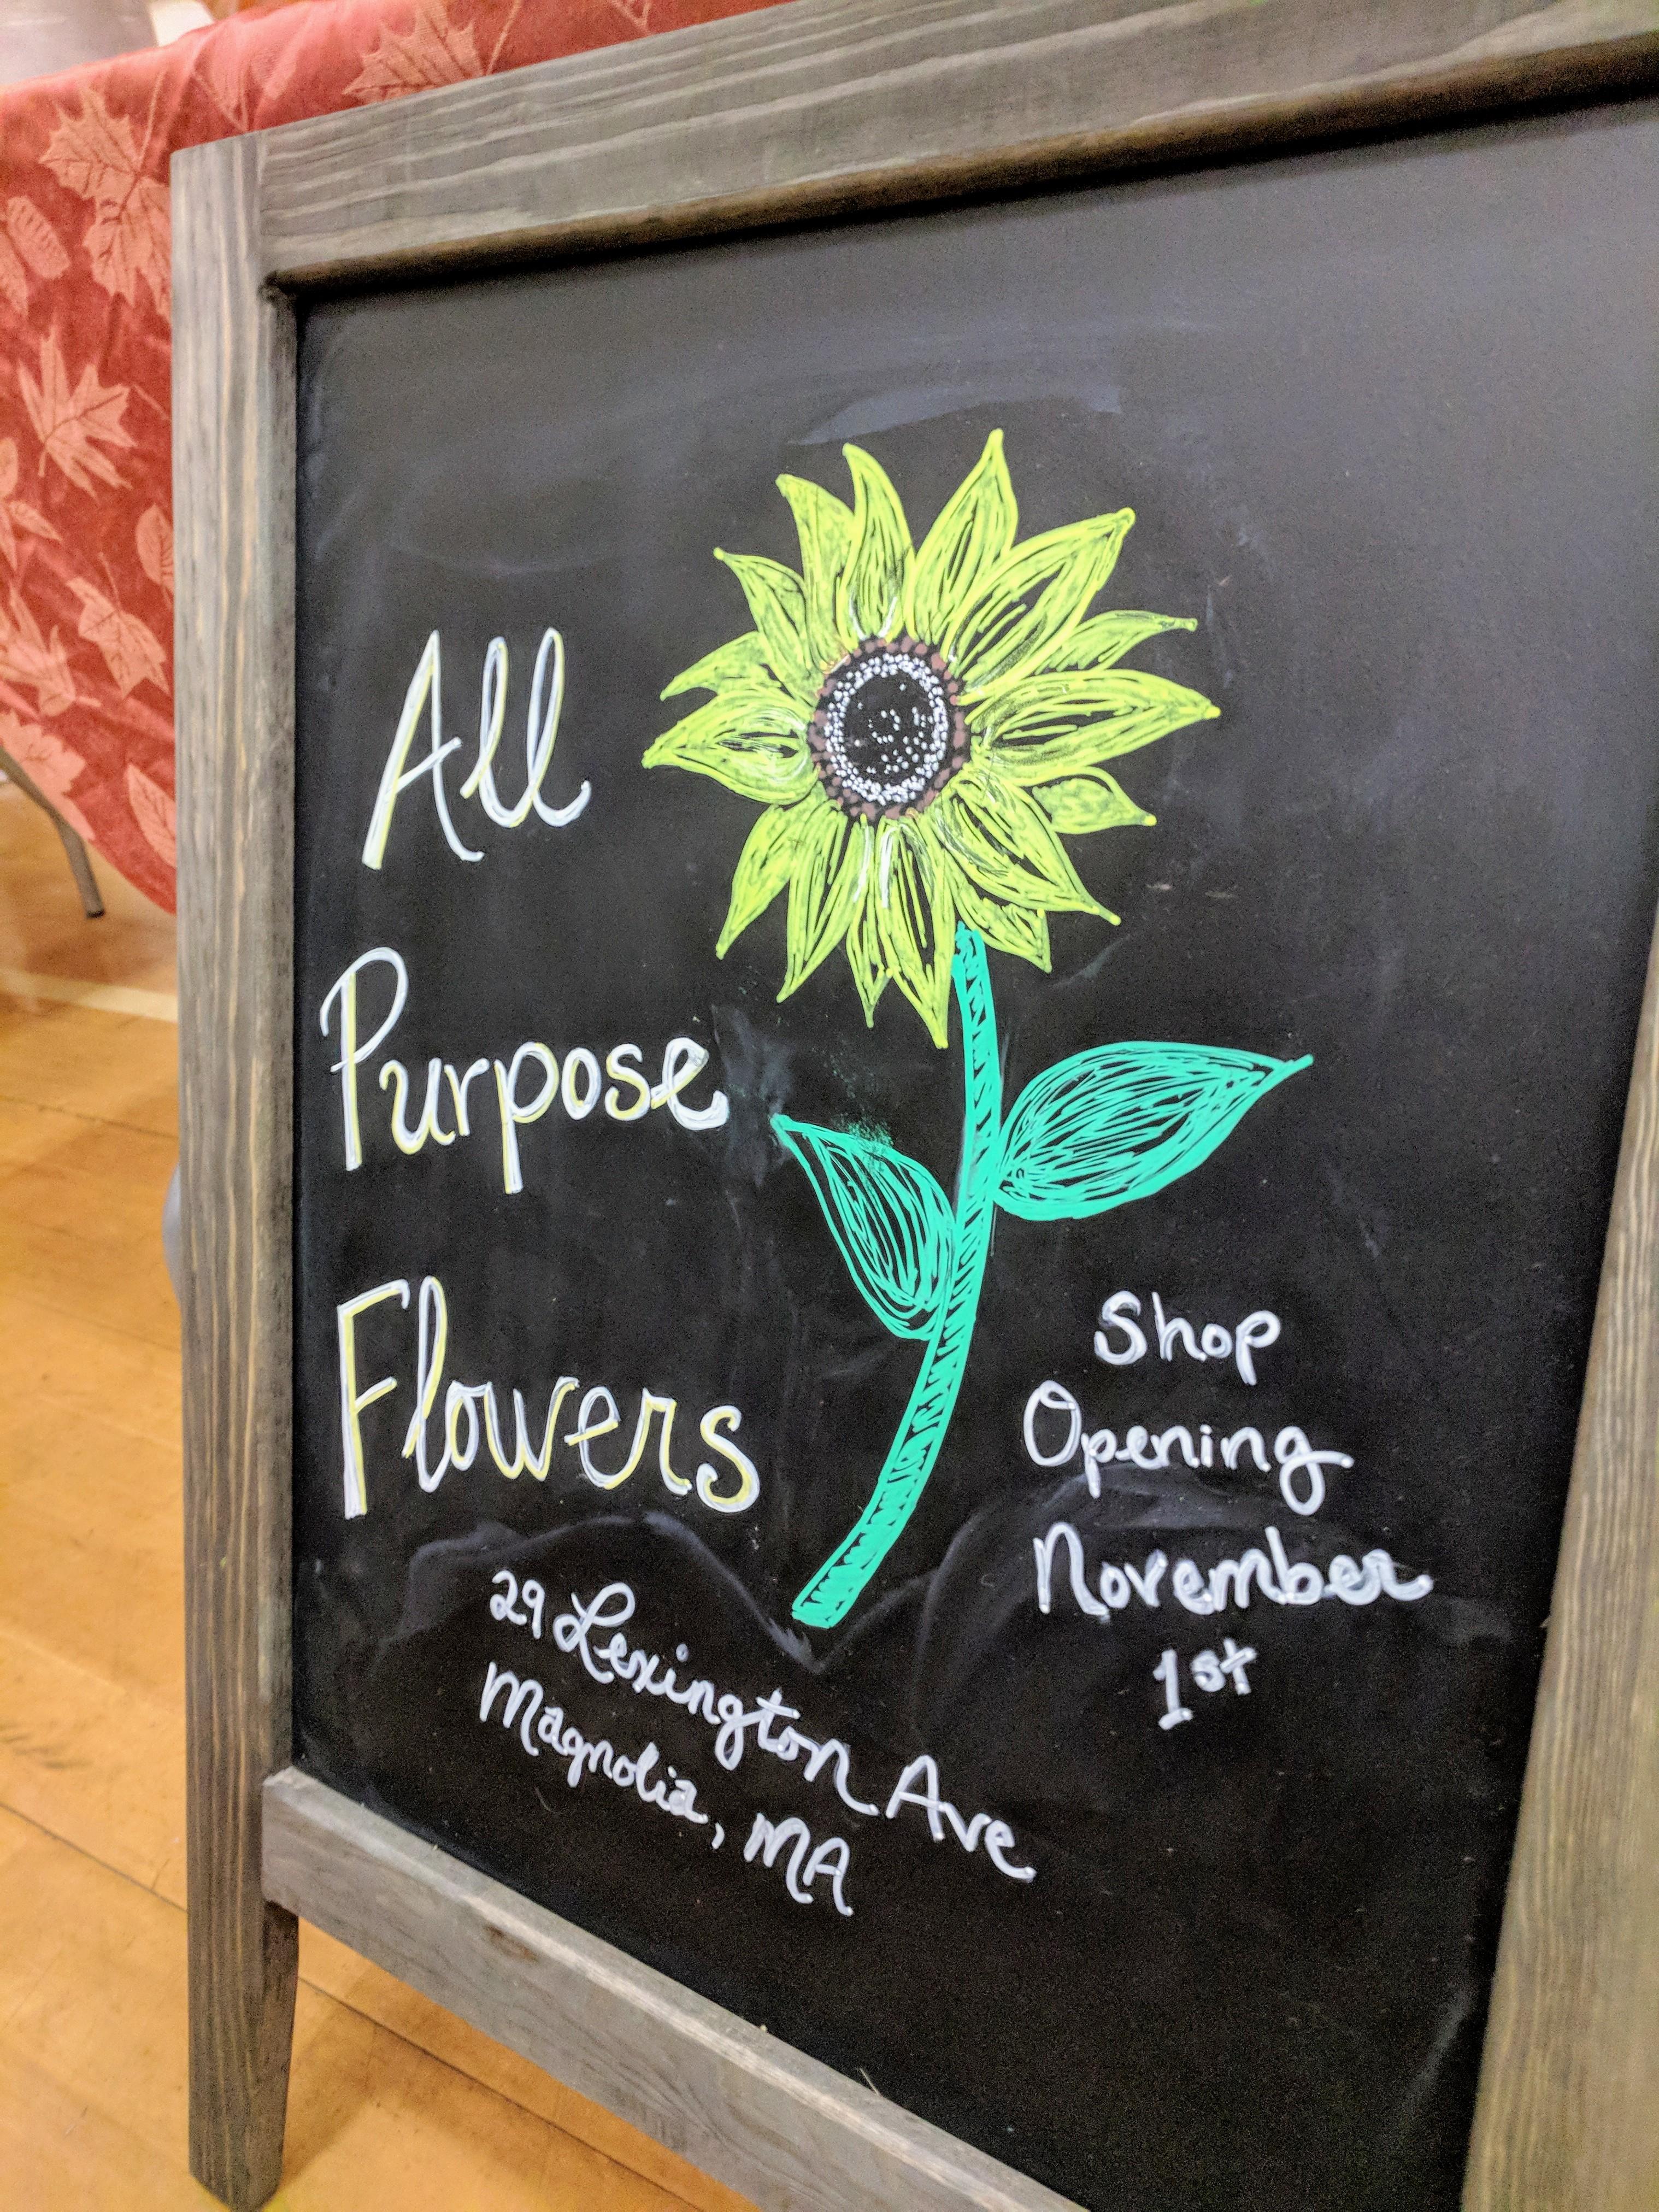 All Purpose Flowers coming to Magnolia November 1_20181012_©Catherine Ryan (2)